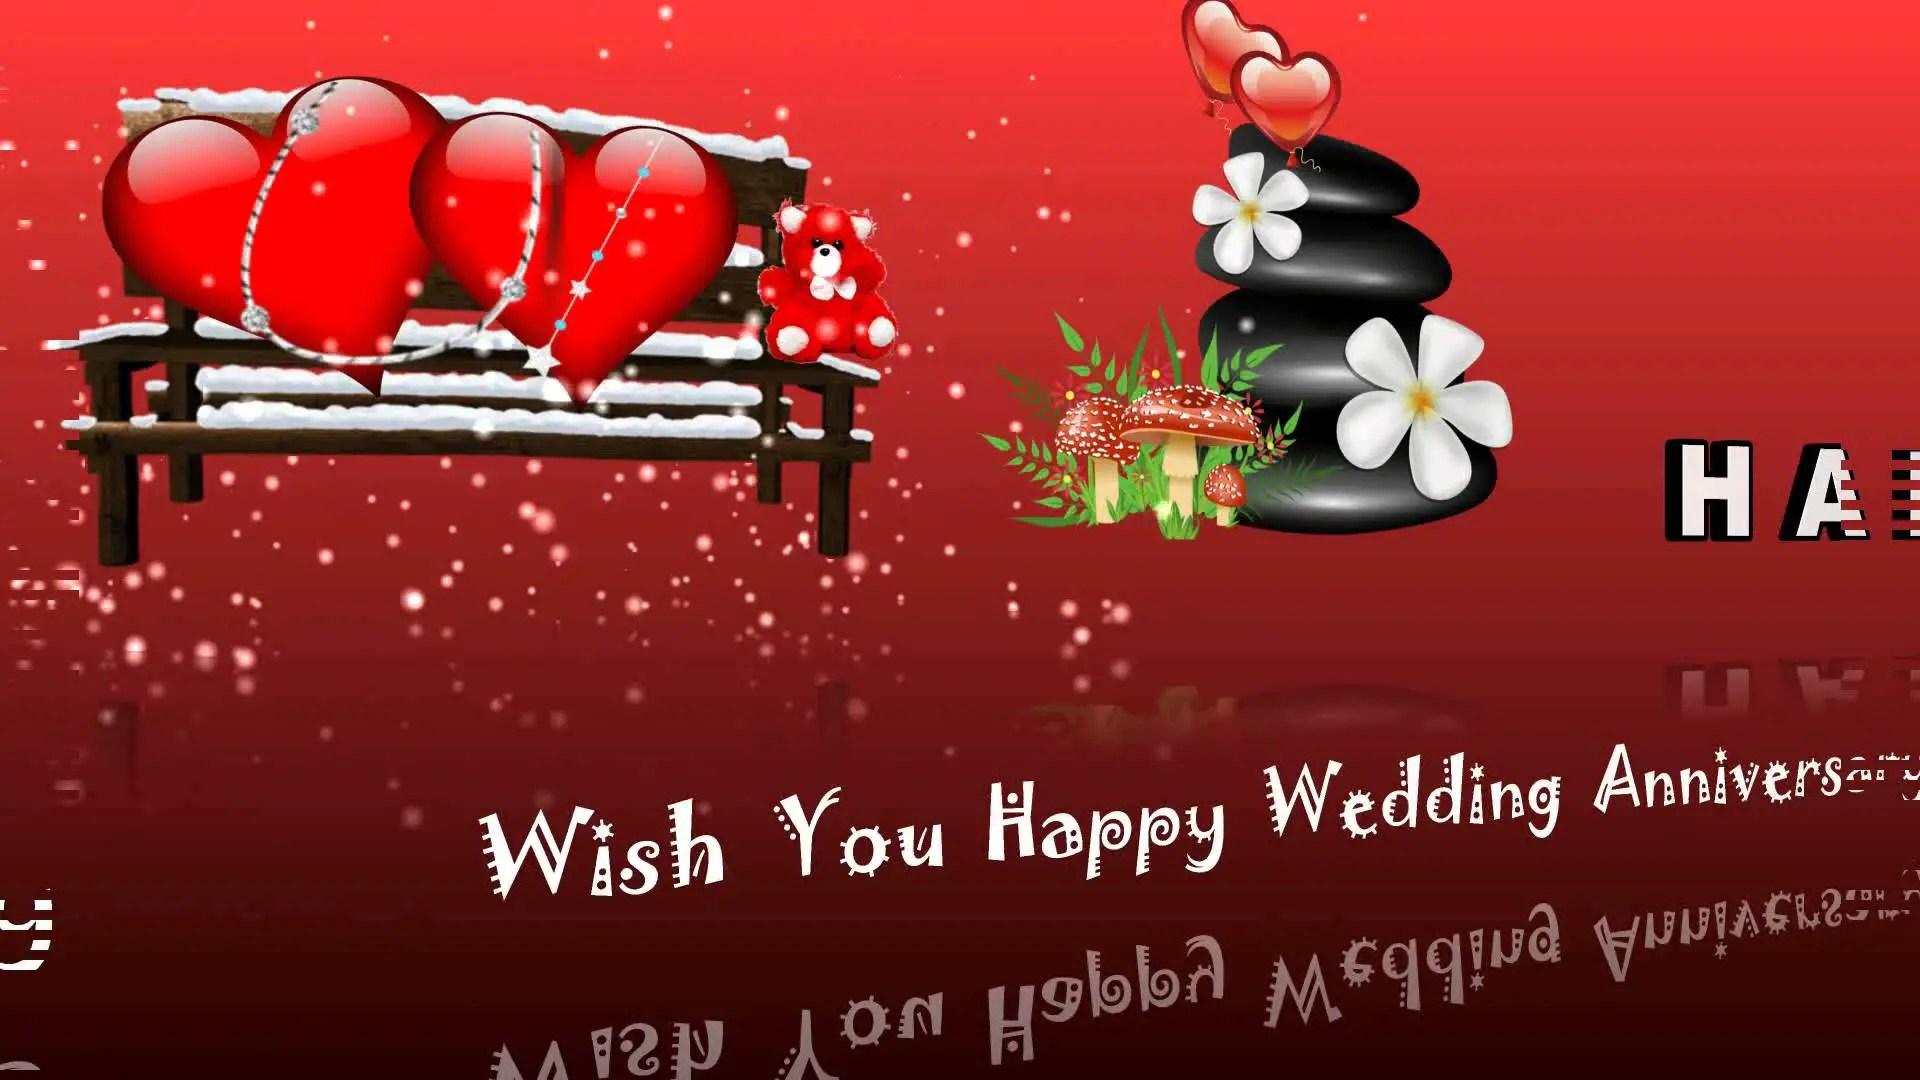 Wish You Happy Wedding Anniversary Desicomments Com